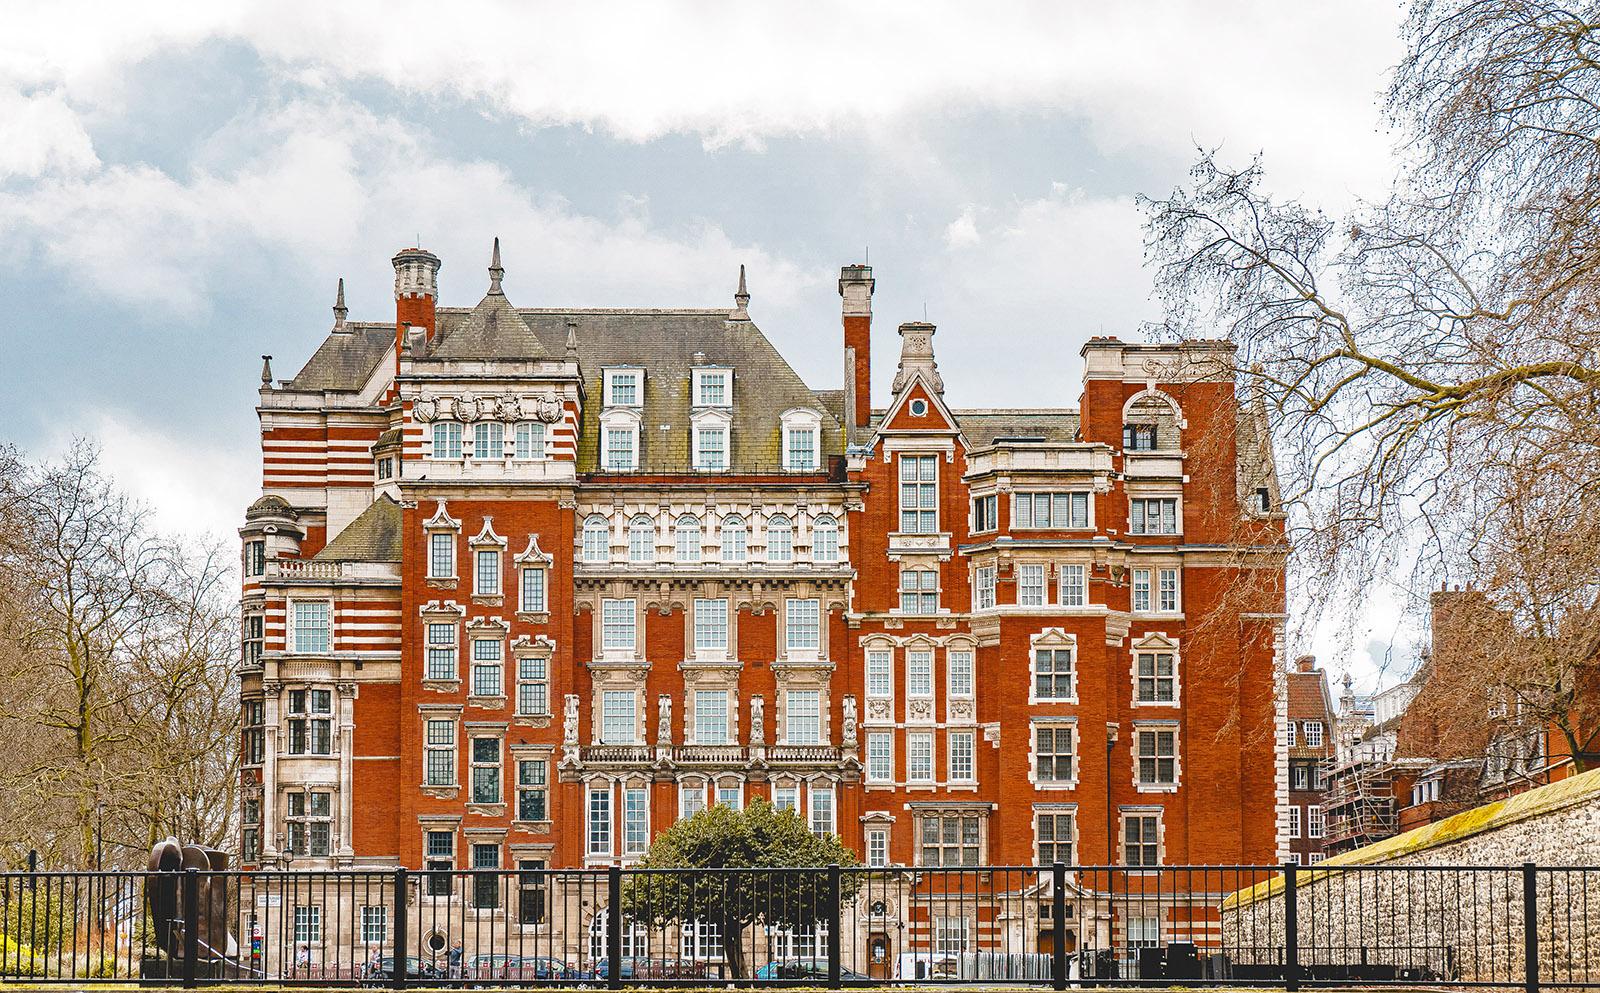 redbrick british manor house